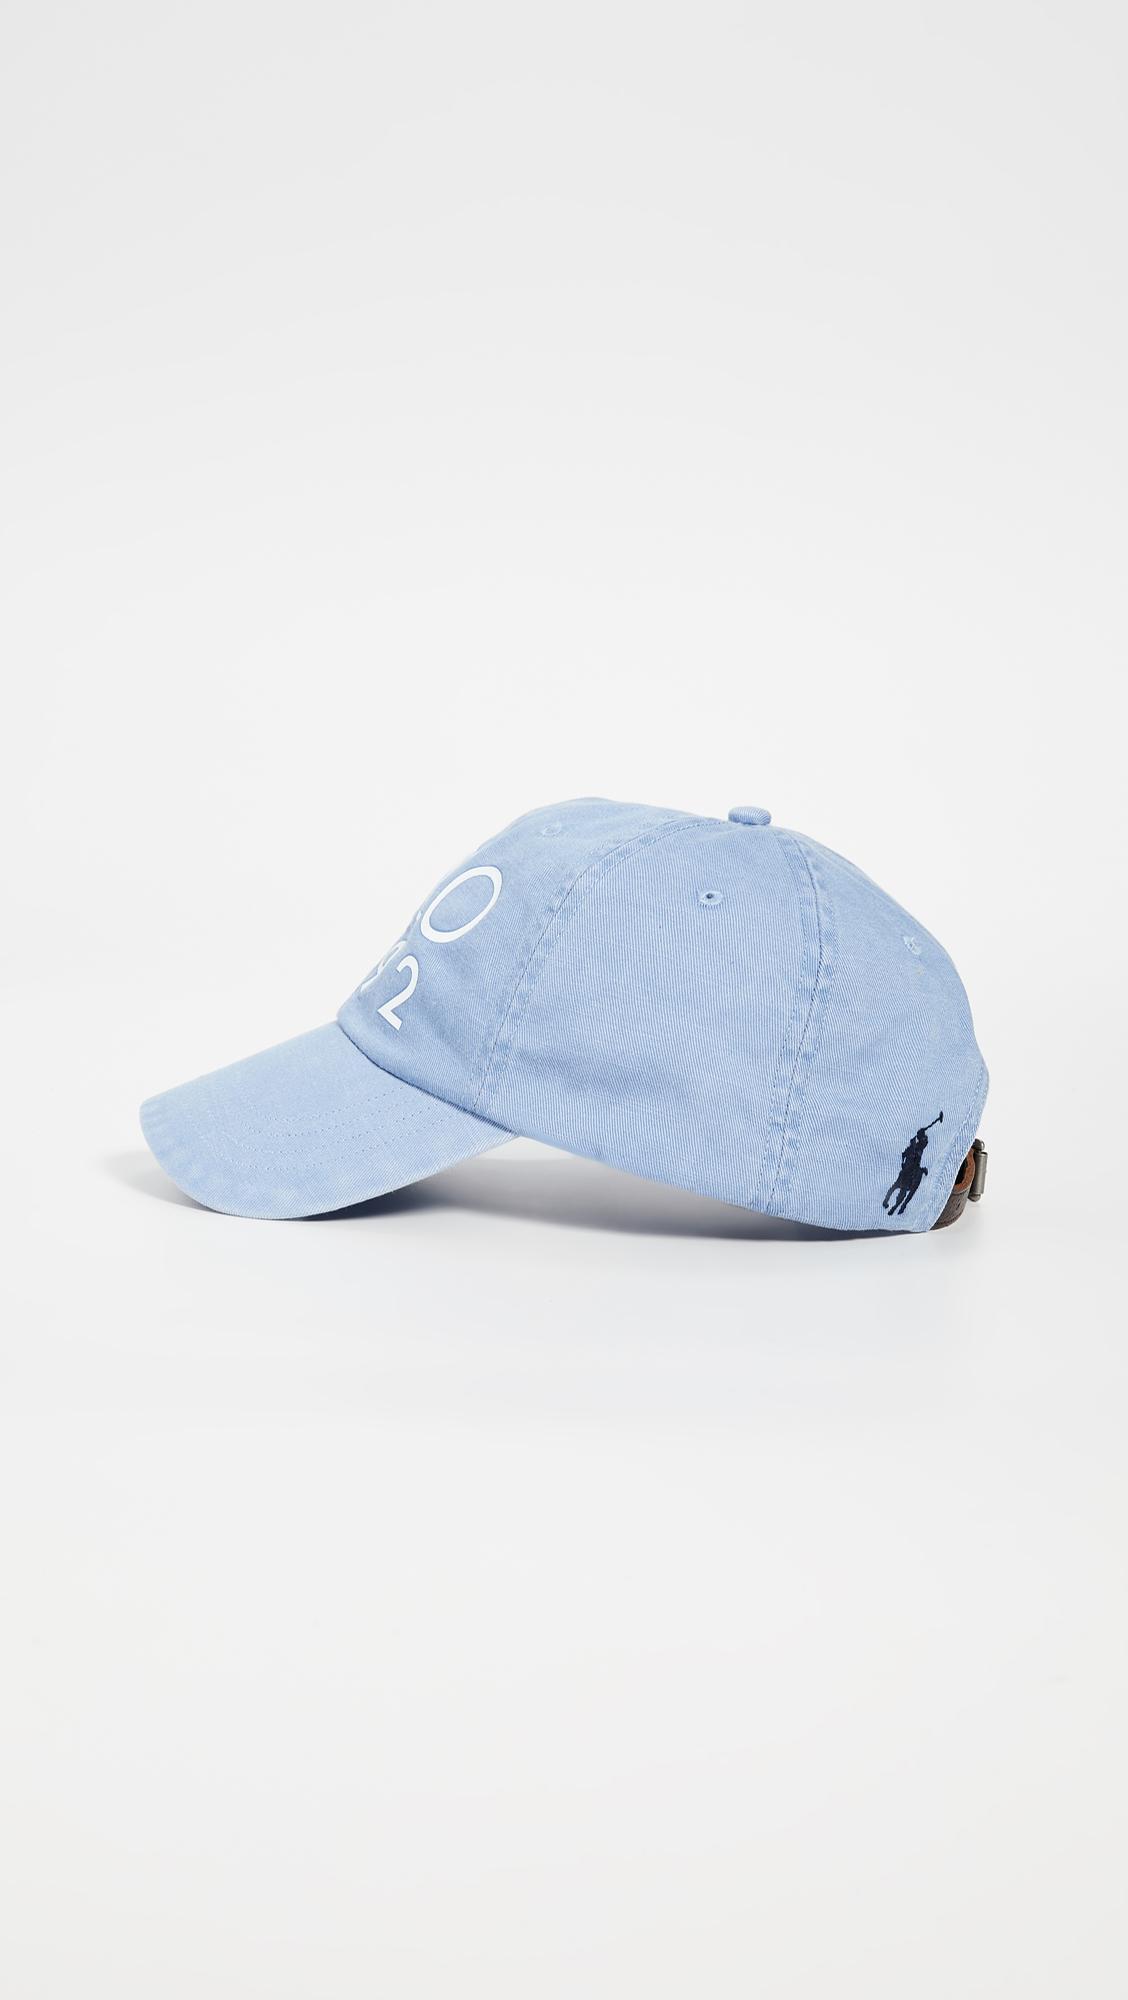 b9b92e08e Men's Blue Montauk 1992 Chino Cap